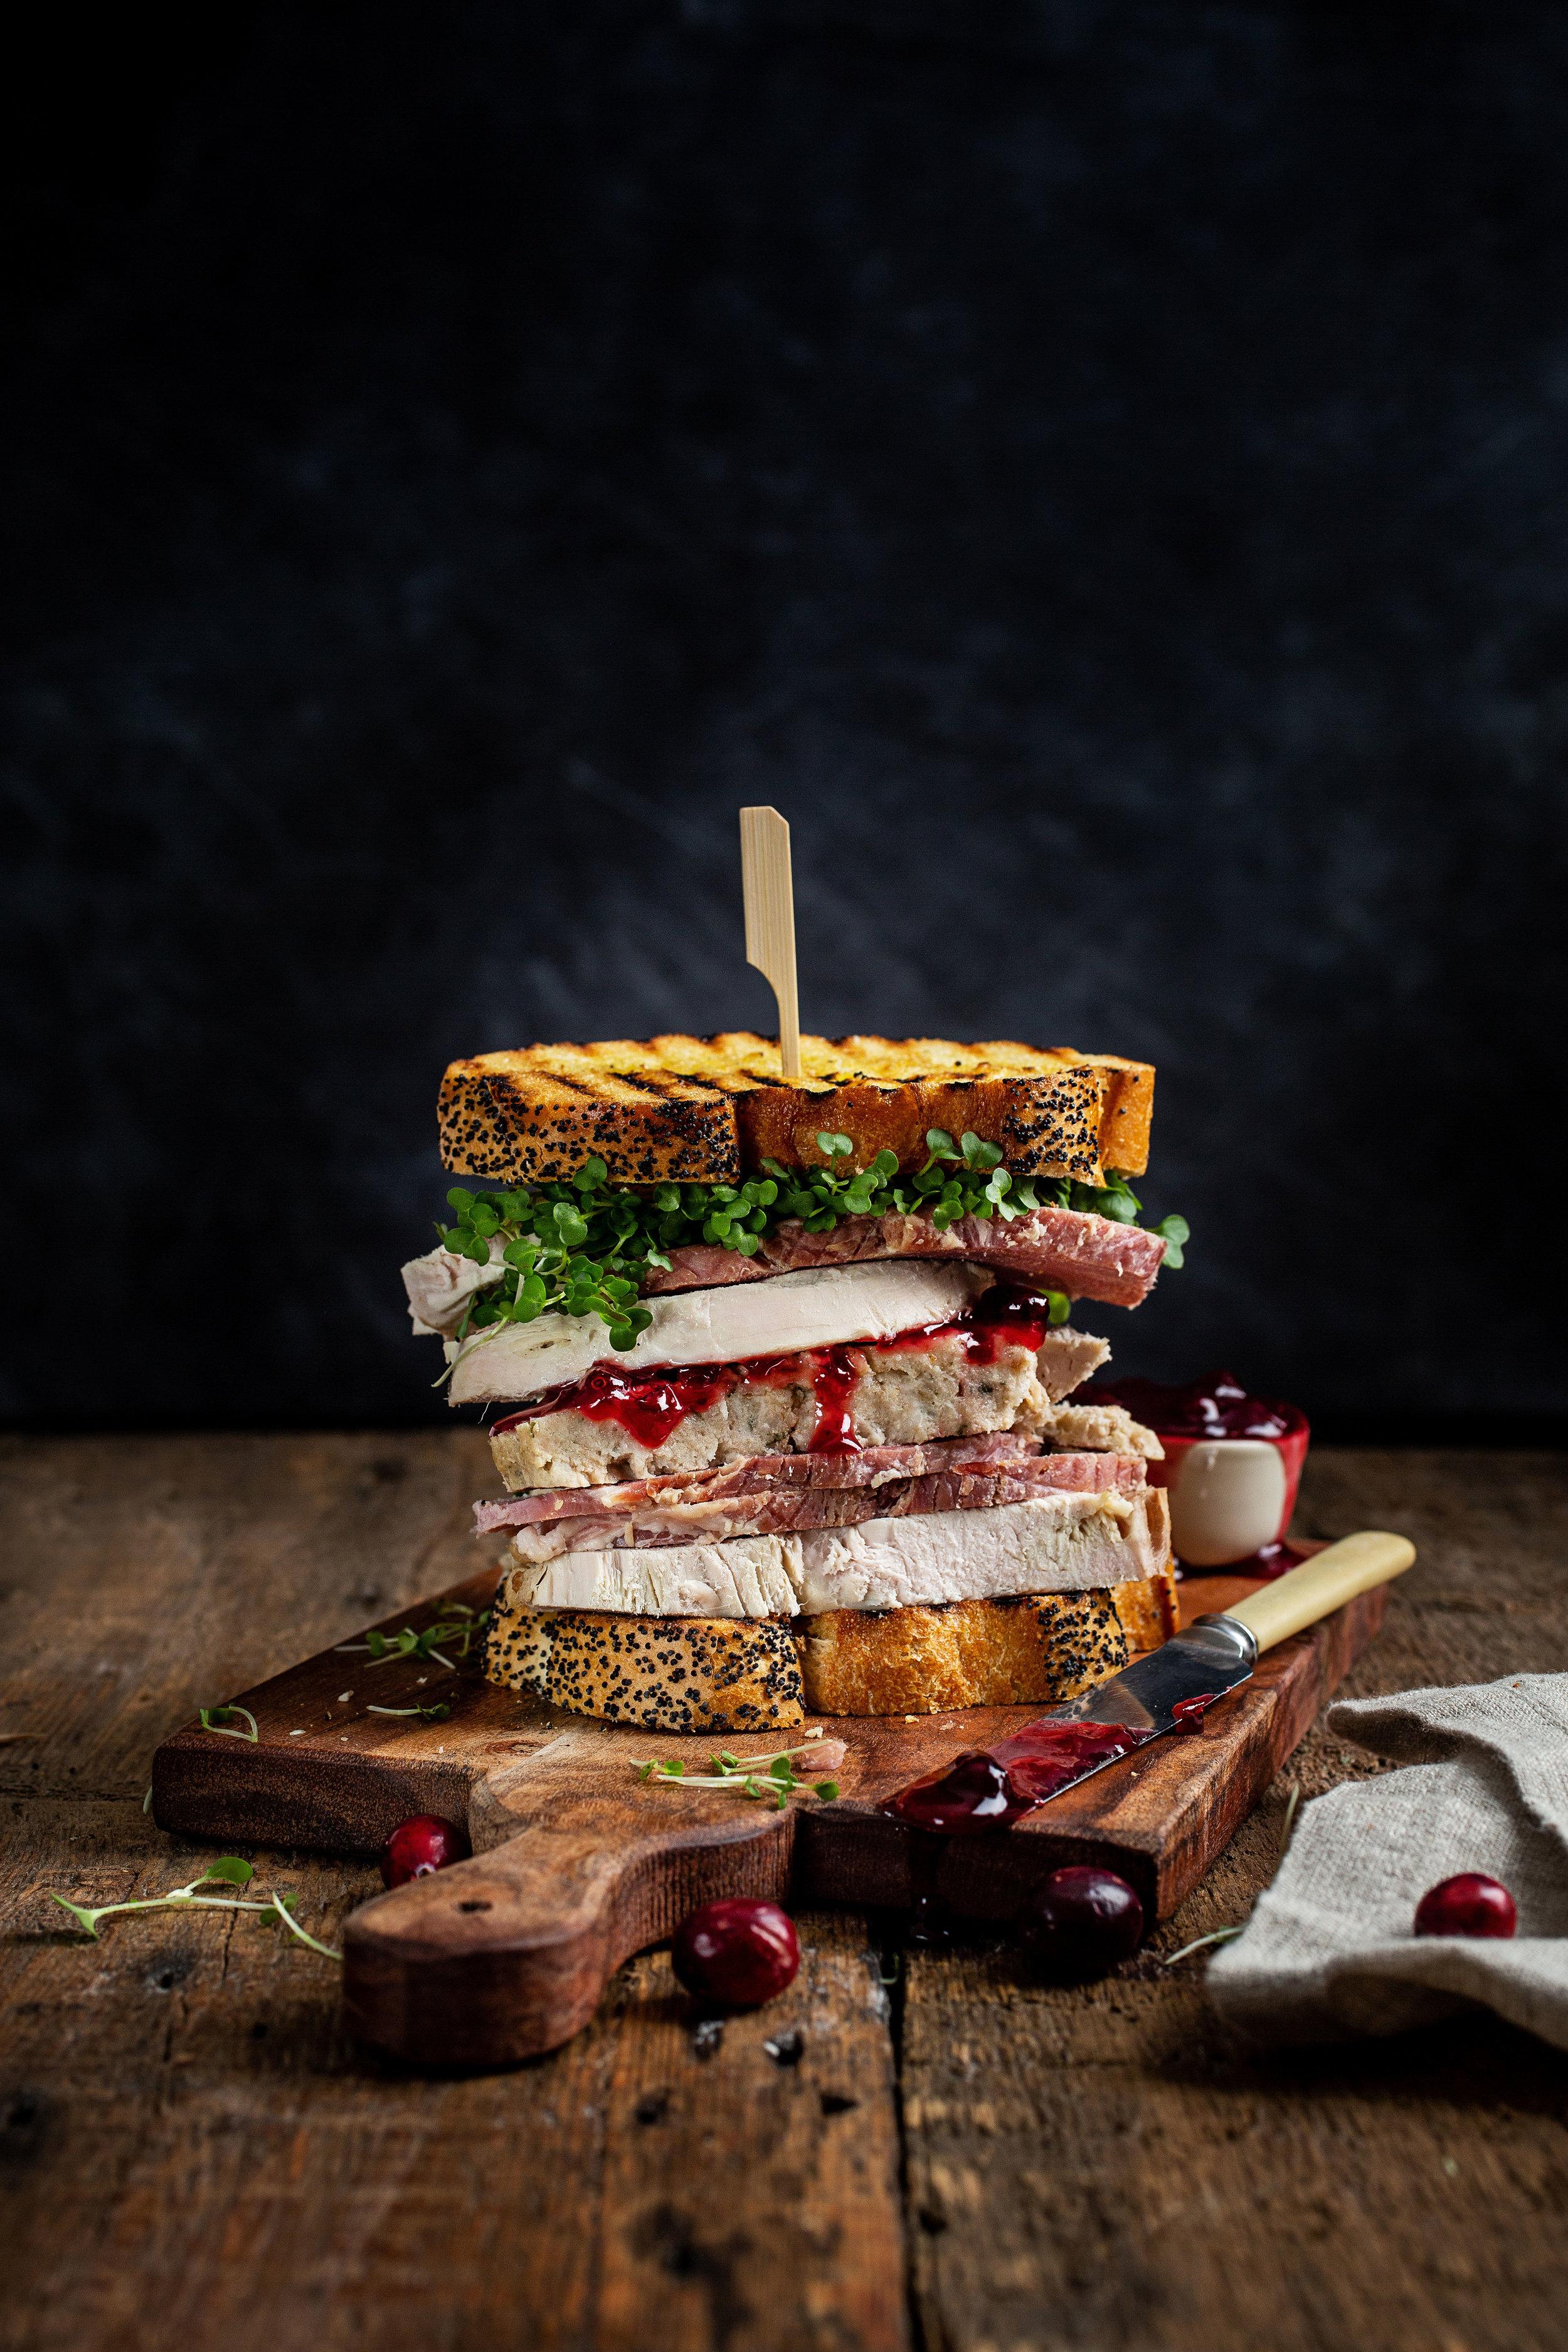 Boxing-day-epic-turkey-sandwich-056.jpg